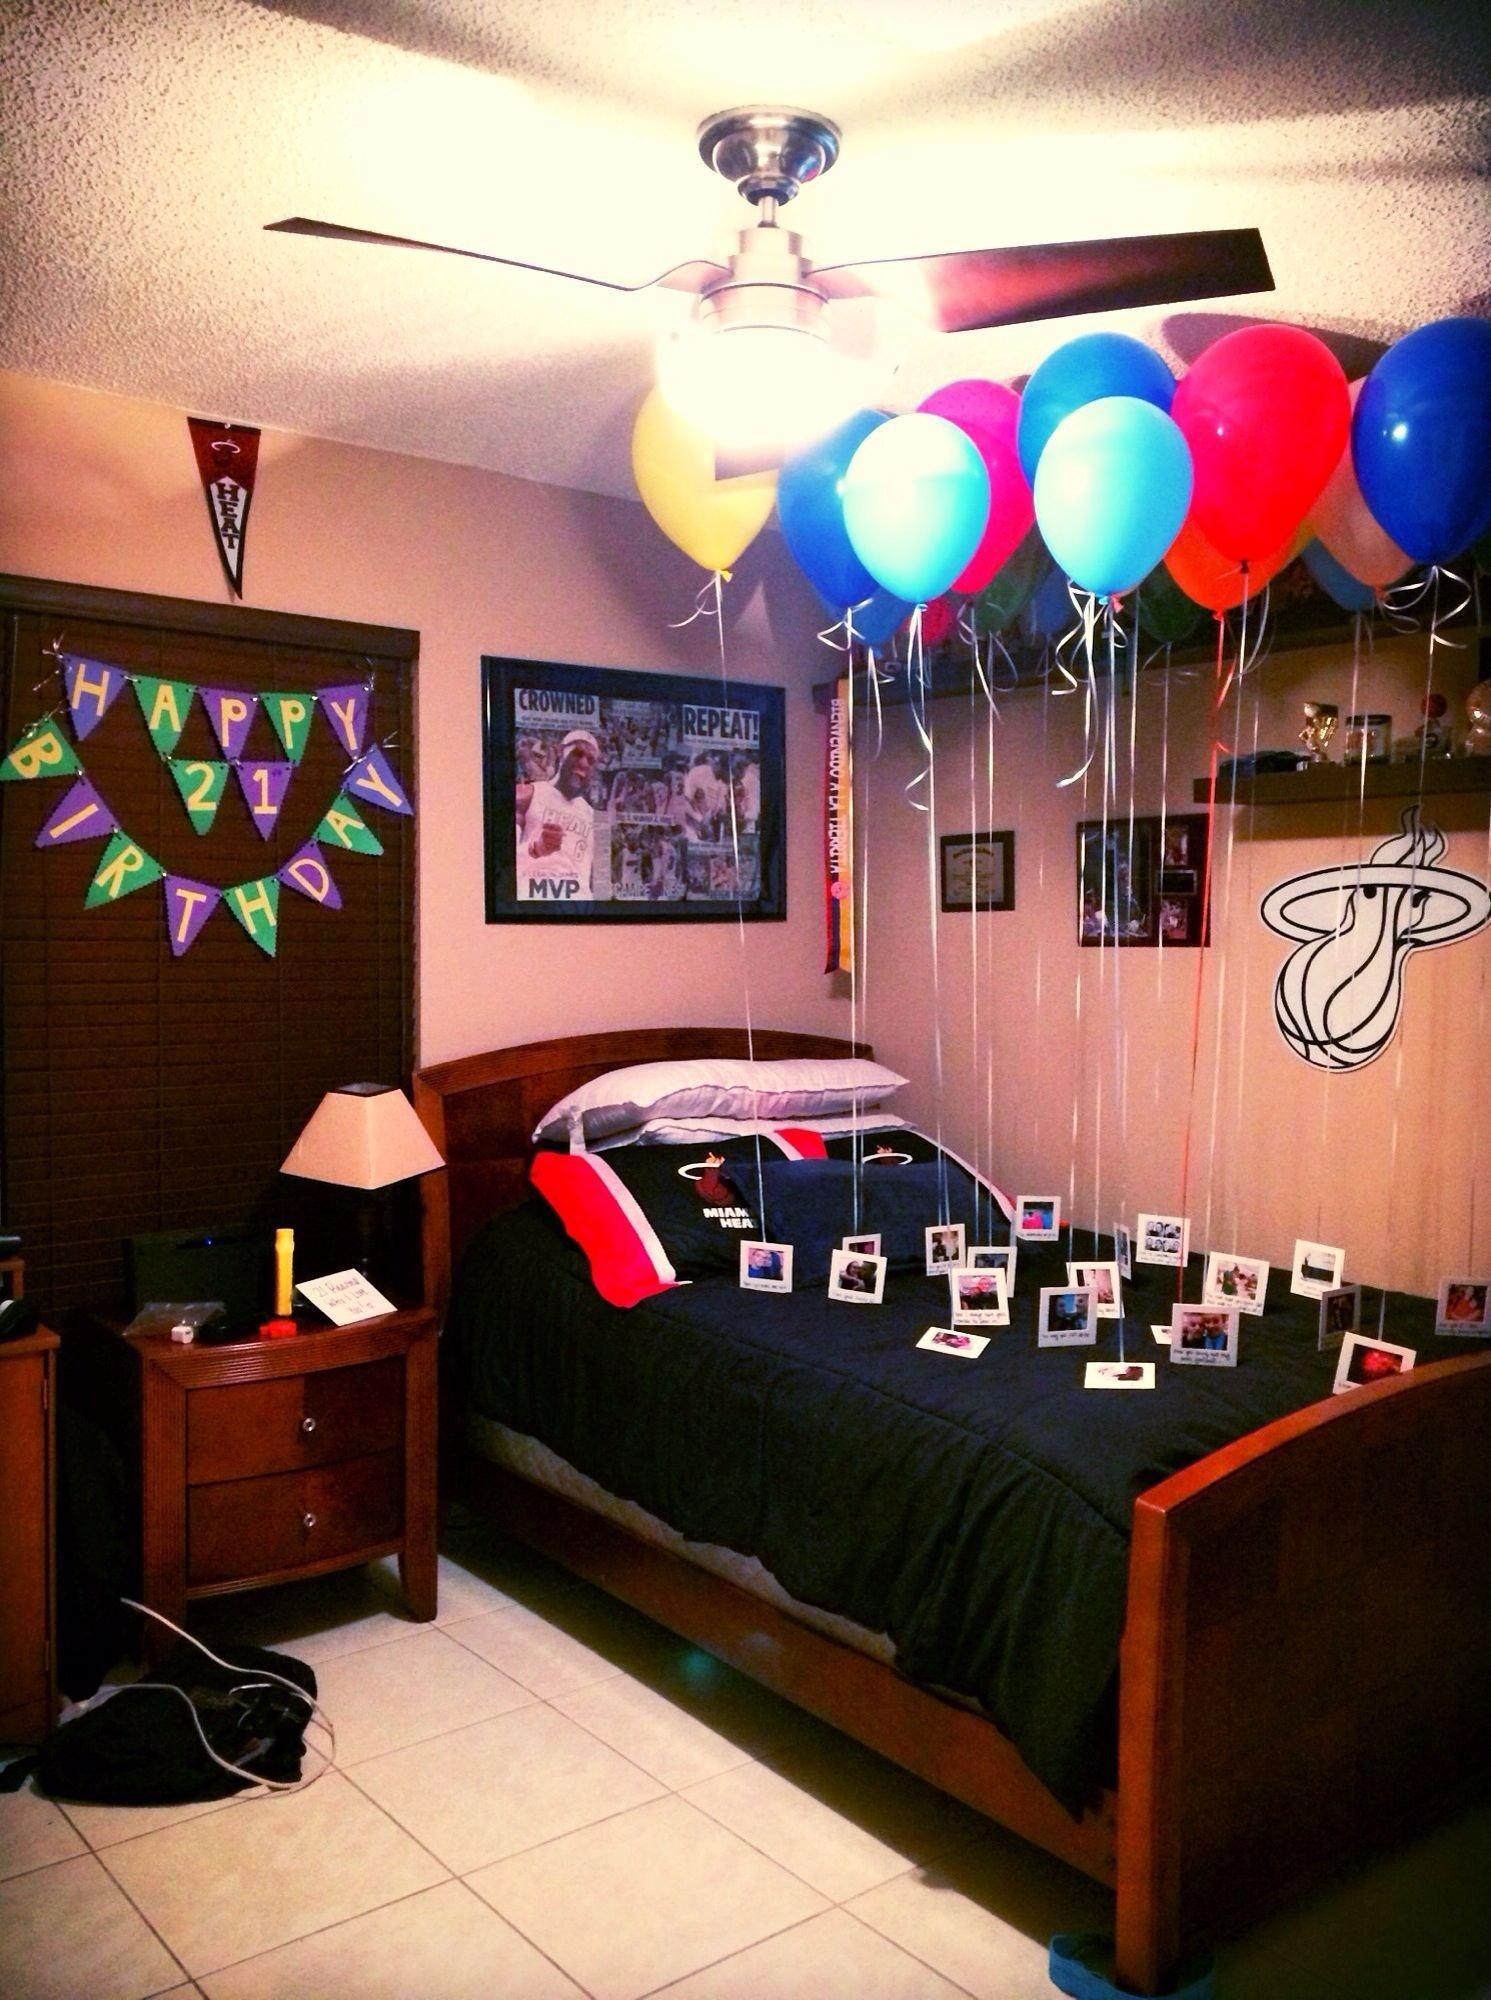 10 Stunning Birthday Ideas For My Boyfriend birthday surprise for boyfriend 21st birthday 21 reasons why i 7 2021